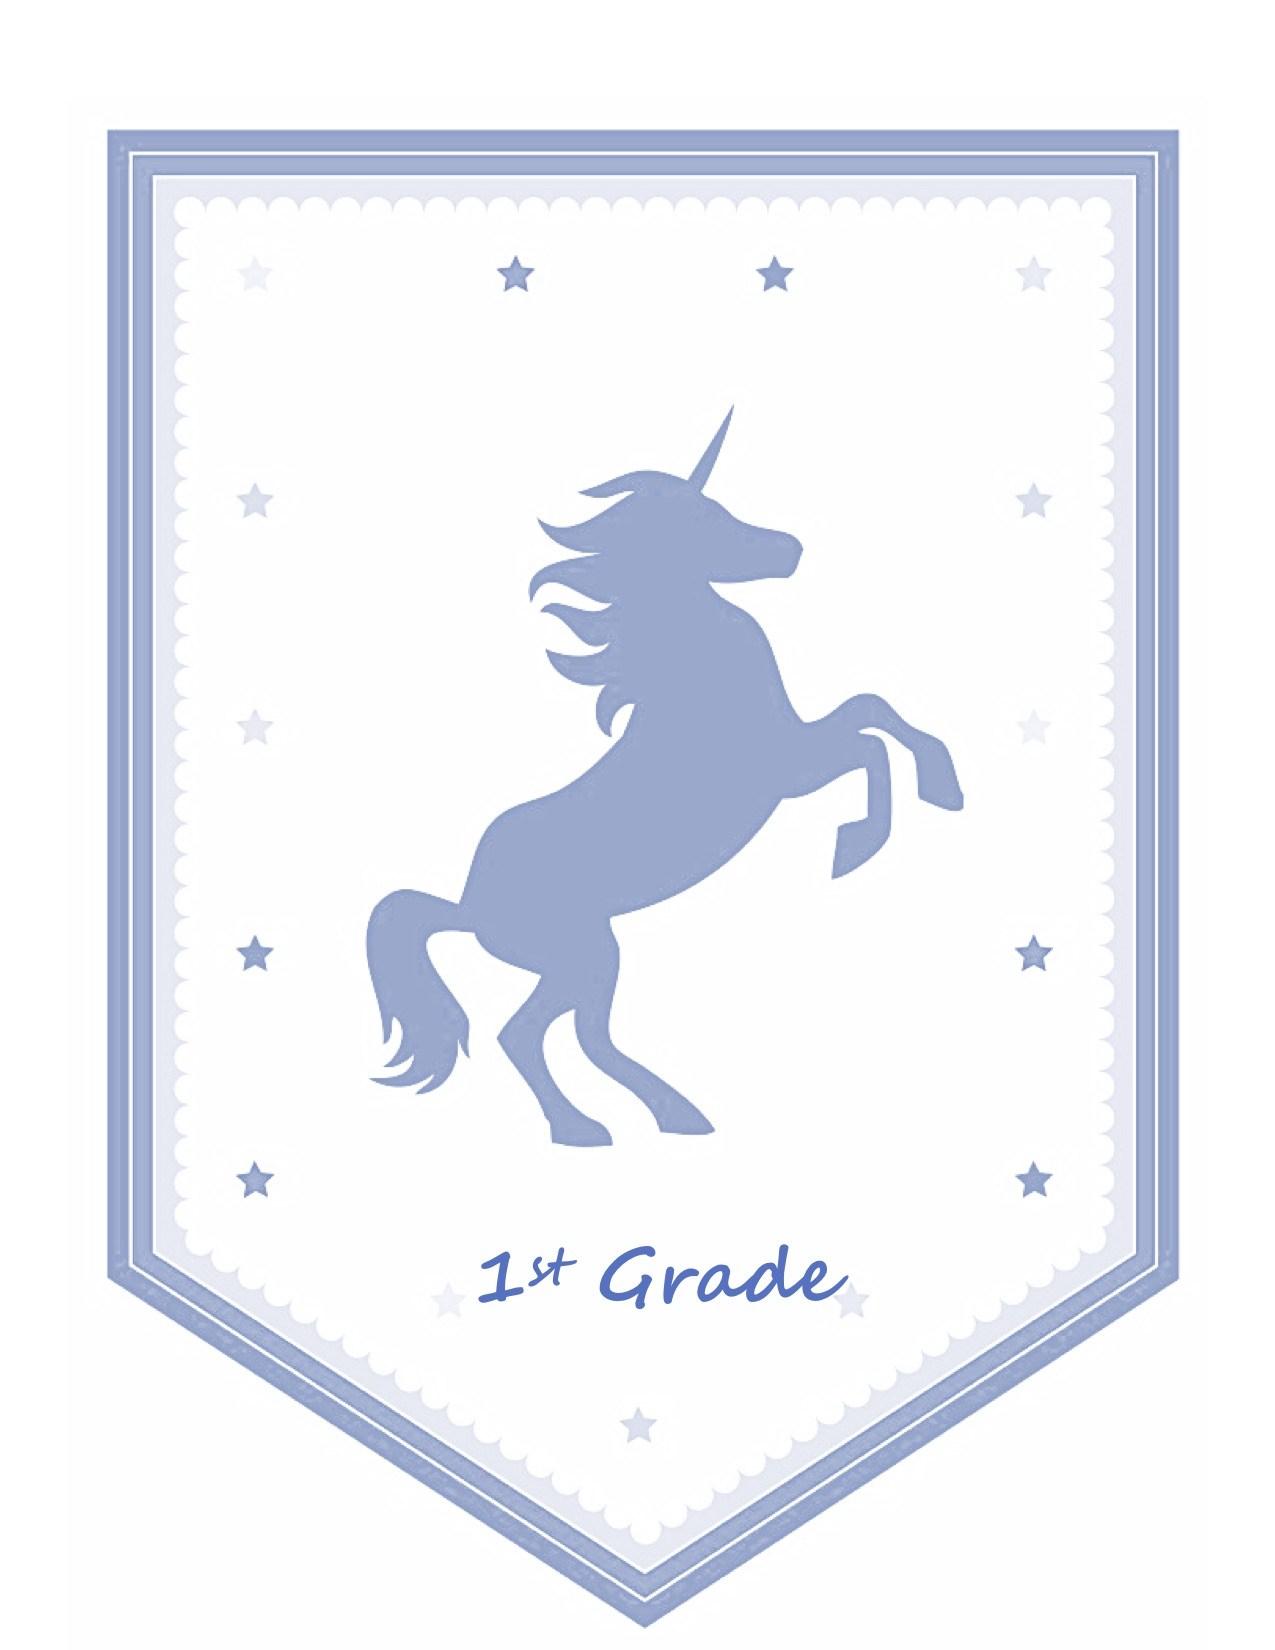 1st Grade Unicorn